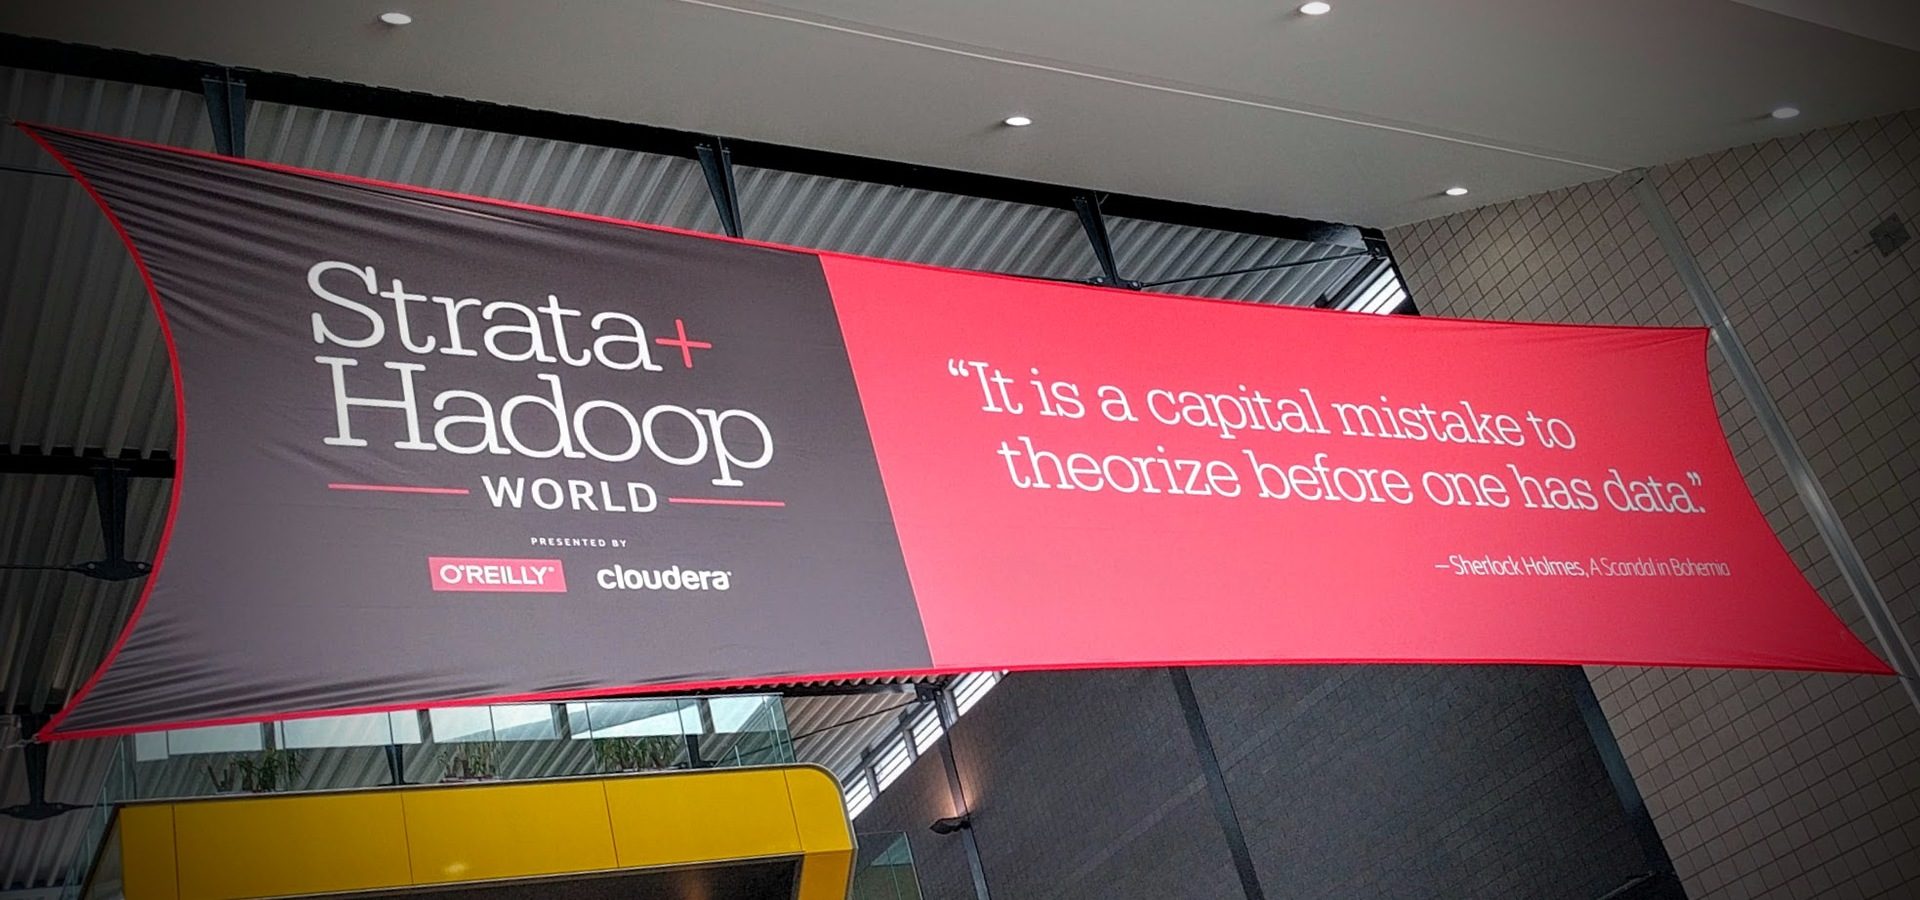 Strata + Hadoop 2016 review